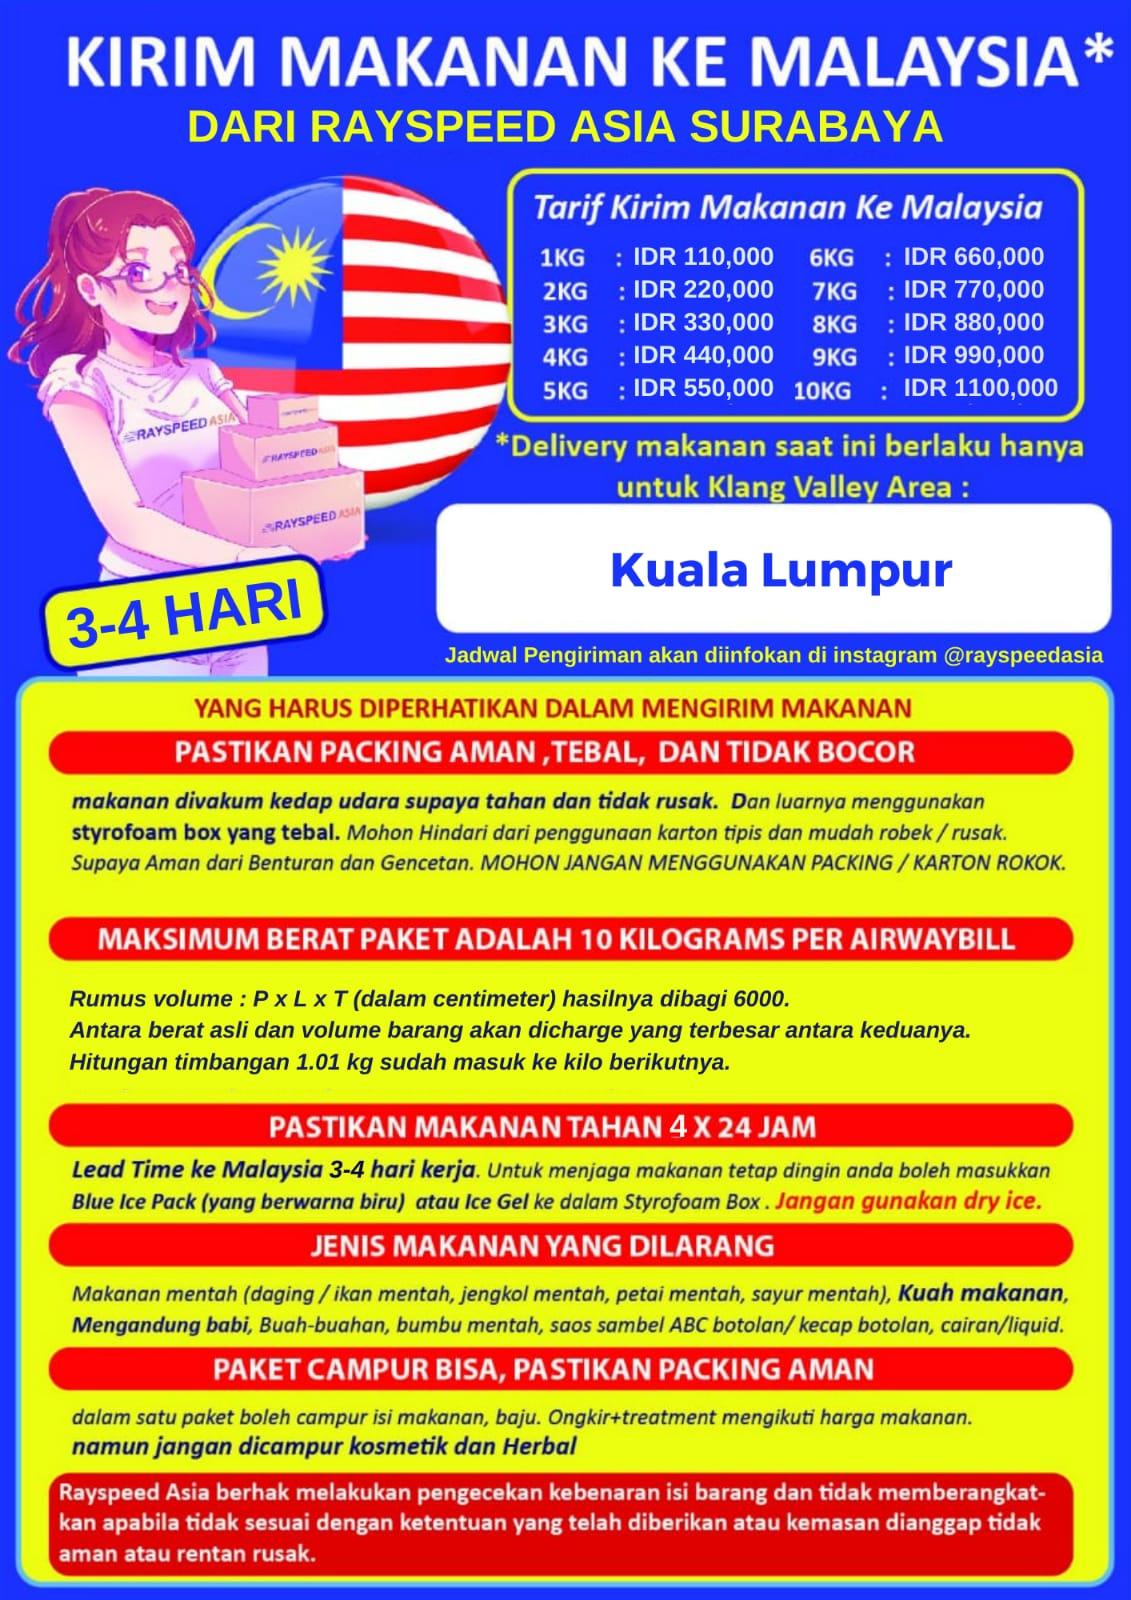 Harga Kiriman Makanan ke Malaysia